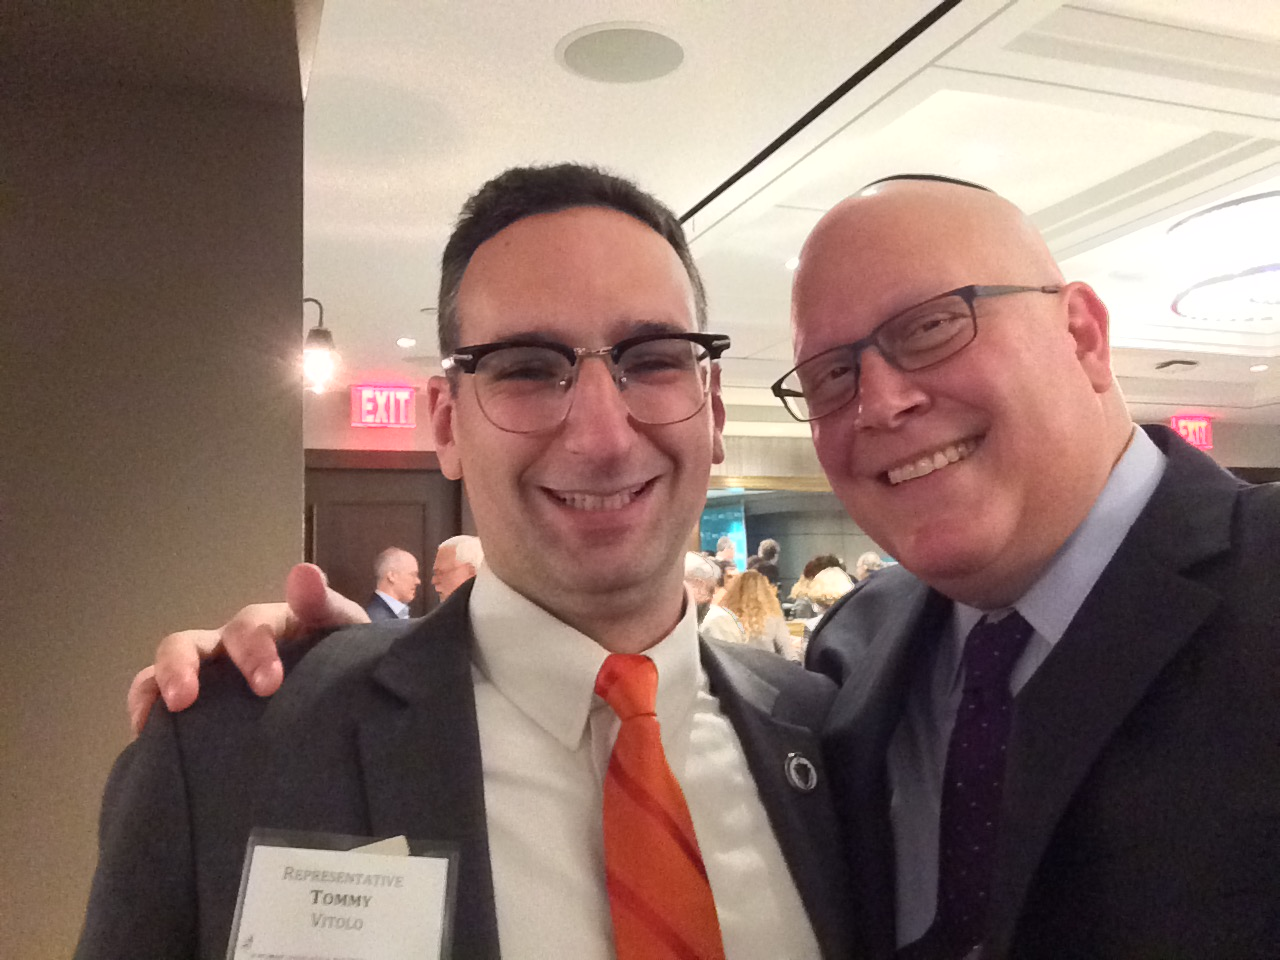 Tommy Vitolo and Jeremy Burton at a JCRC event